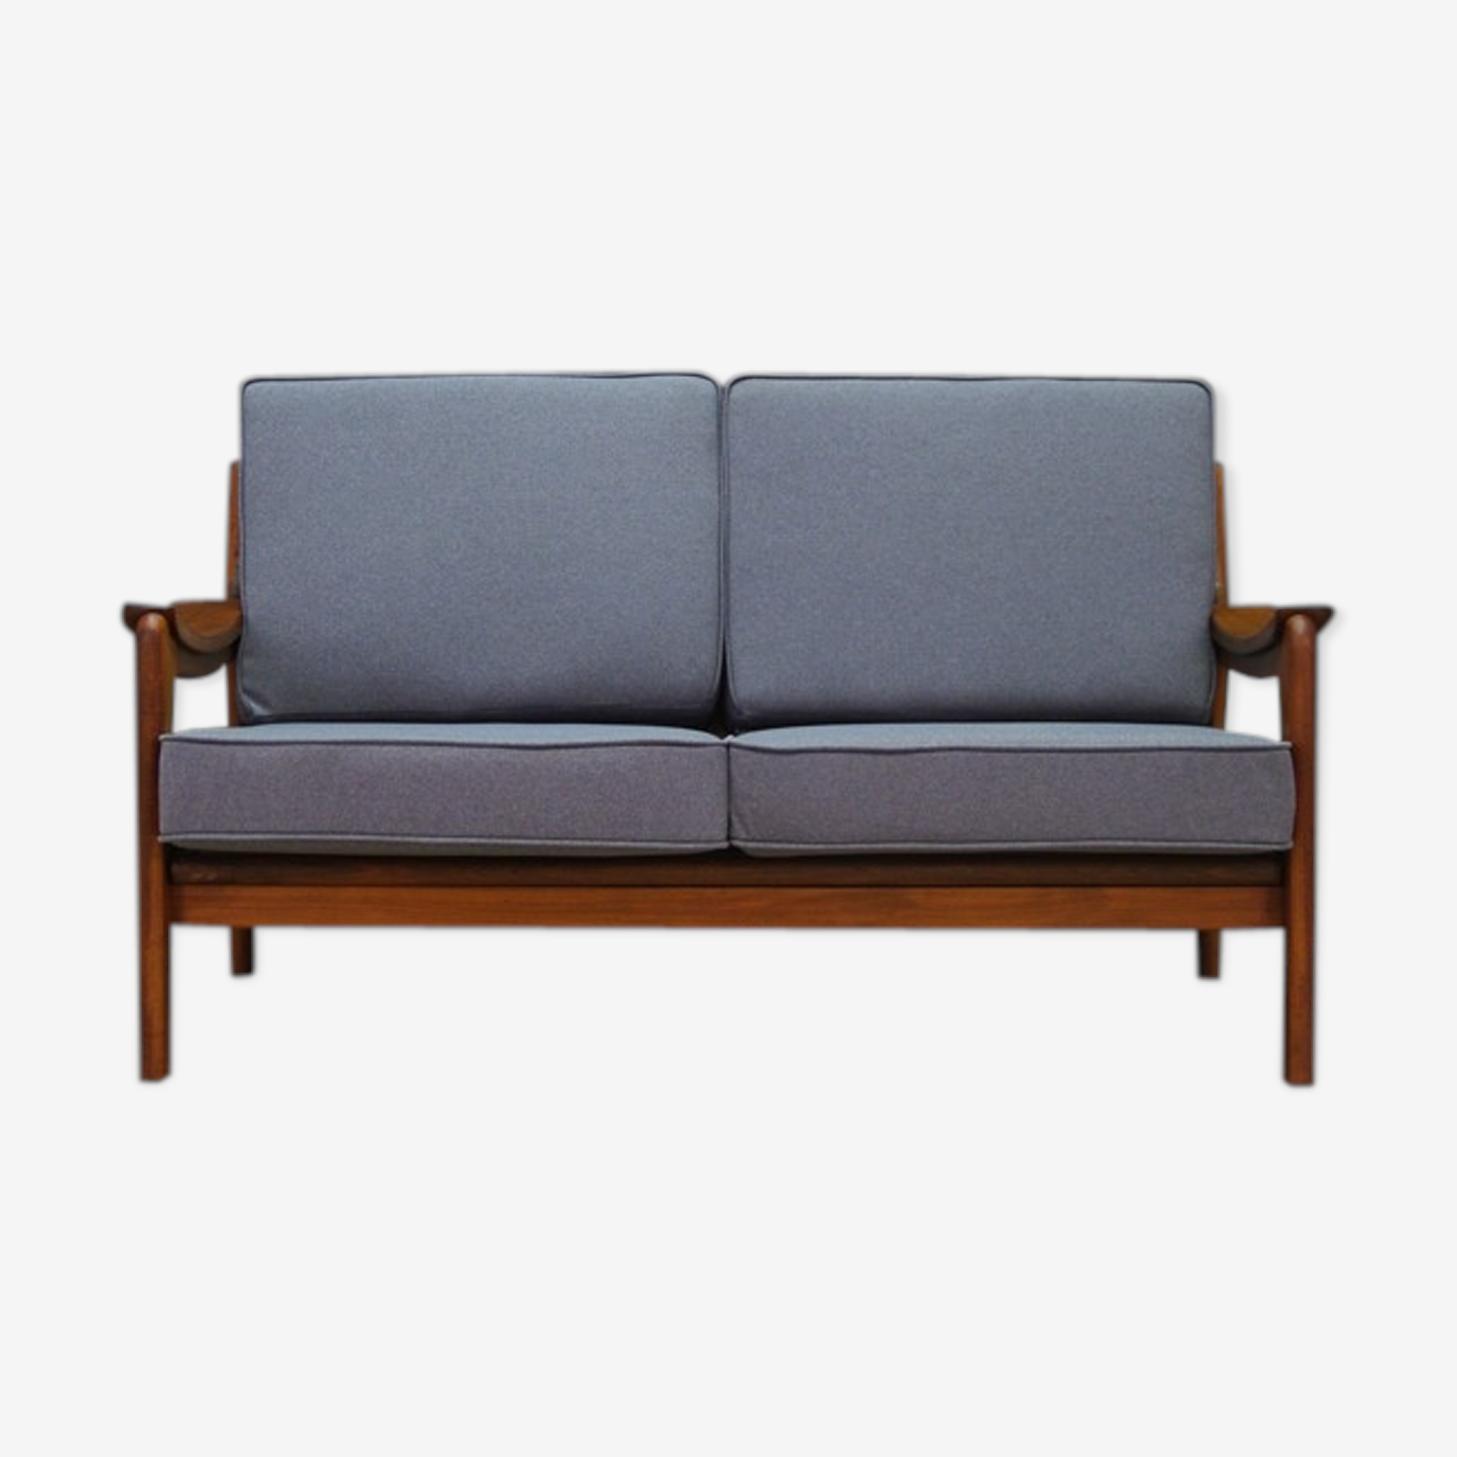 Sofa danish